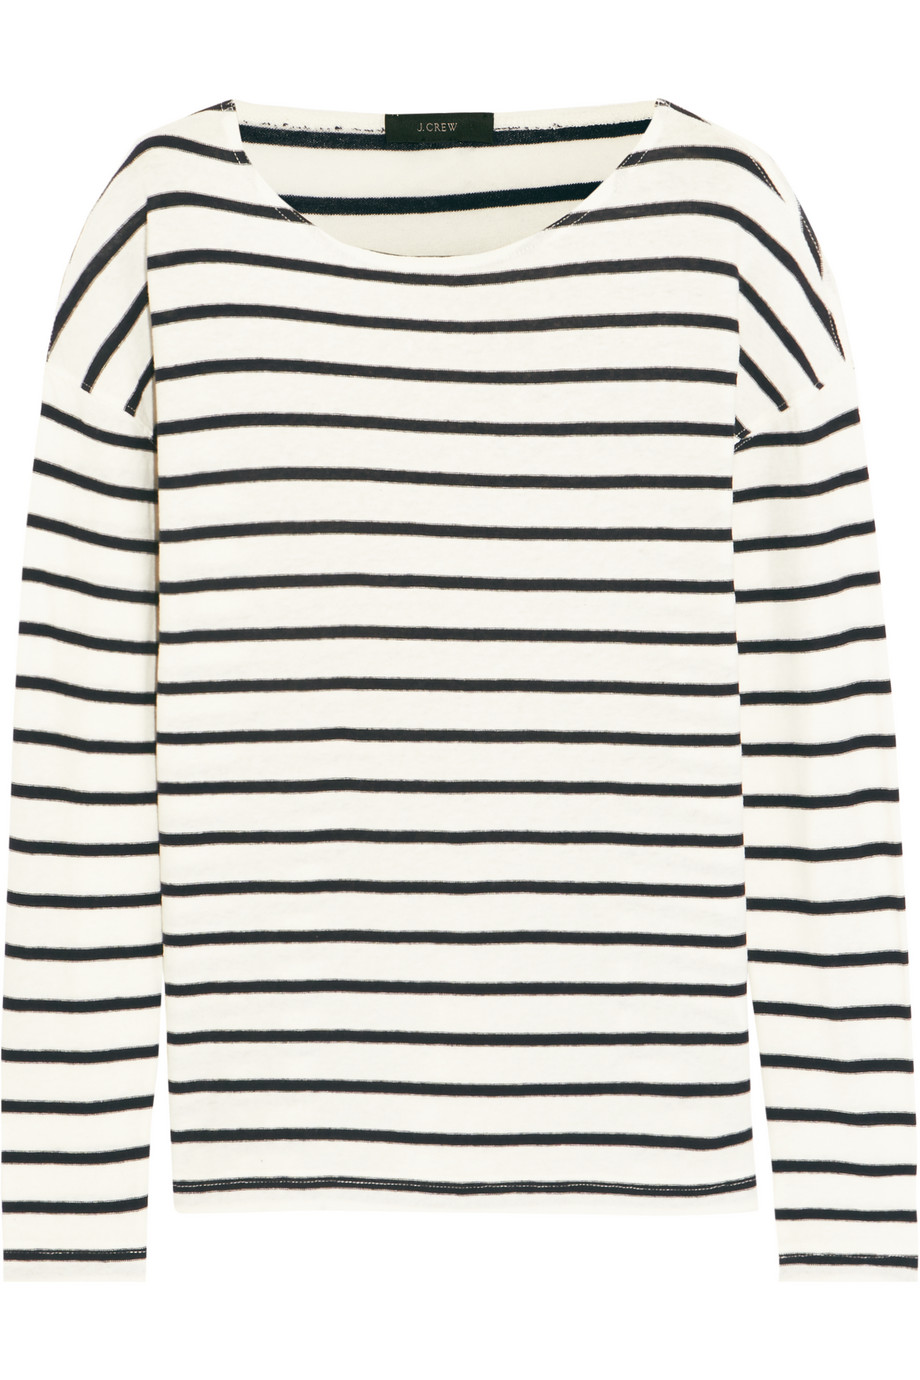 J.Crew Striped Cotton-Jersey Top, Navy, Women's, Size: M